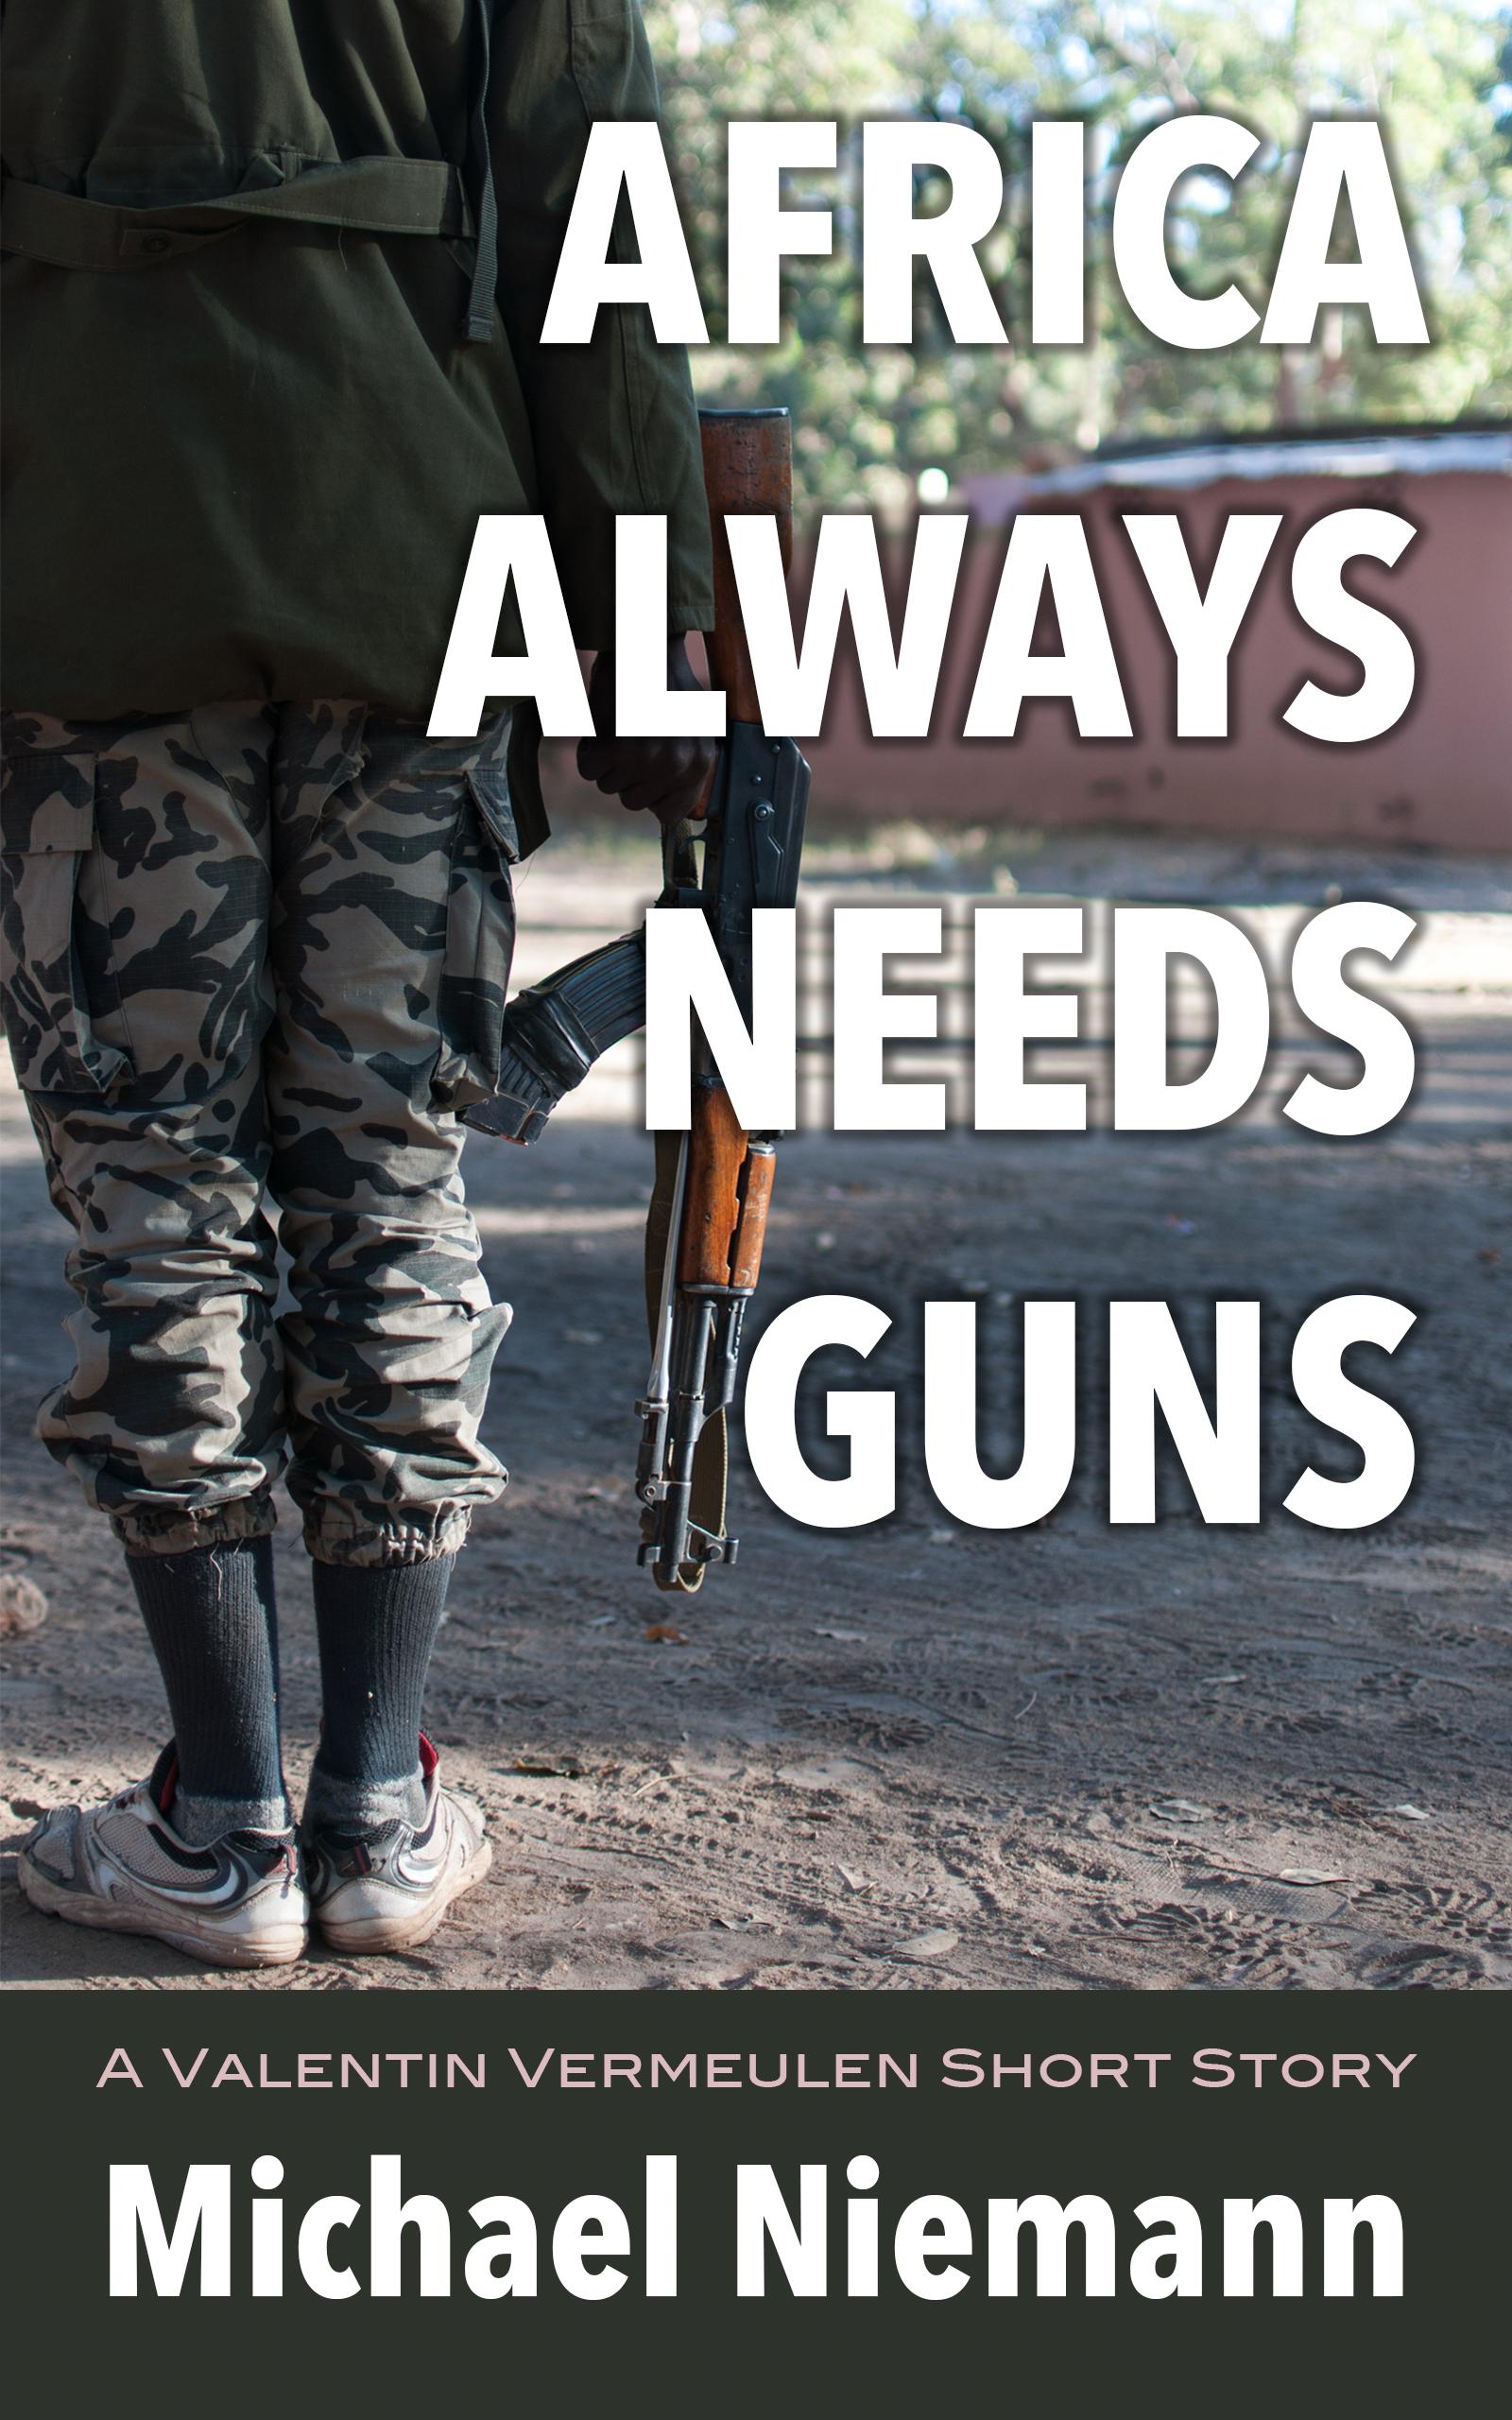 Africa Always Needs Guns by Michael Niemann